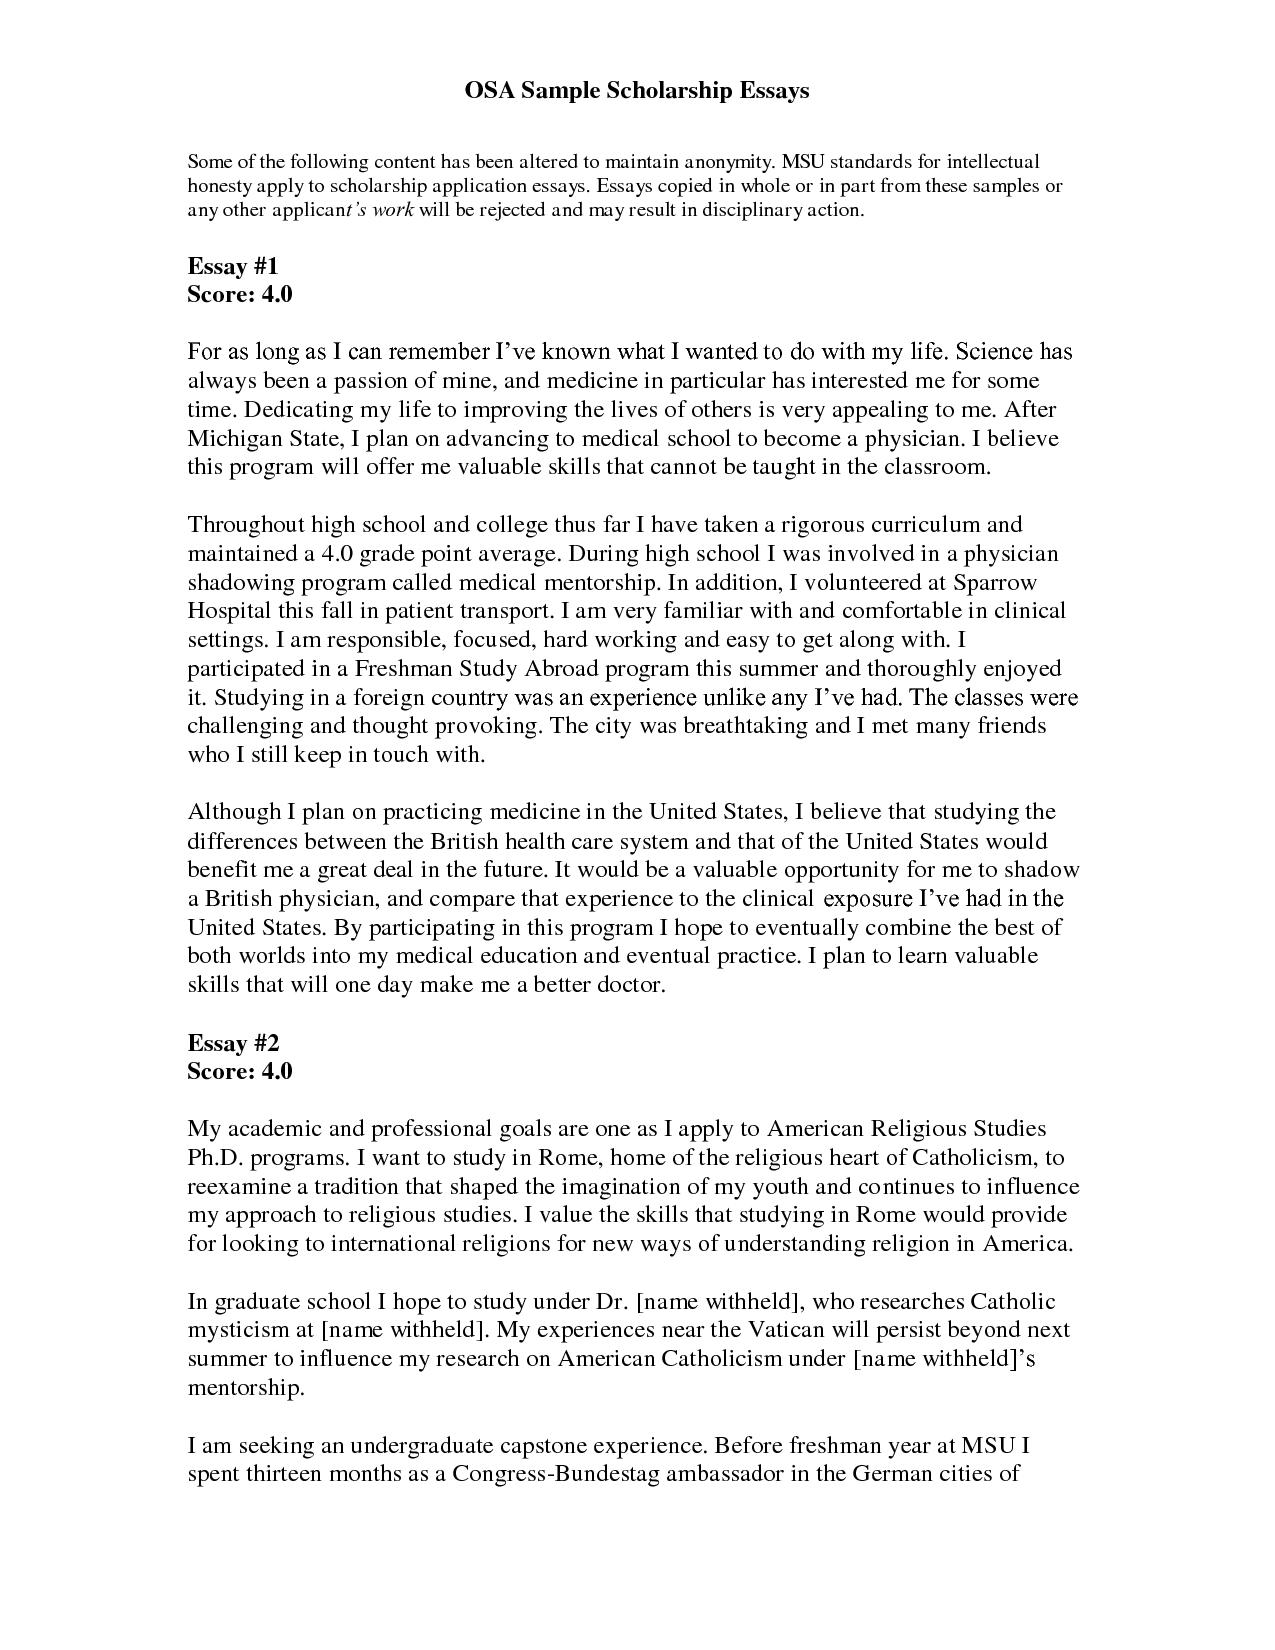 003 Uvs74i83av Scholarships Essay Singular Centralis Scholarship Topics Chevening Tips About Yourself Full